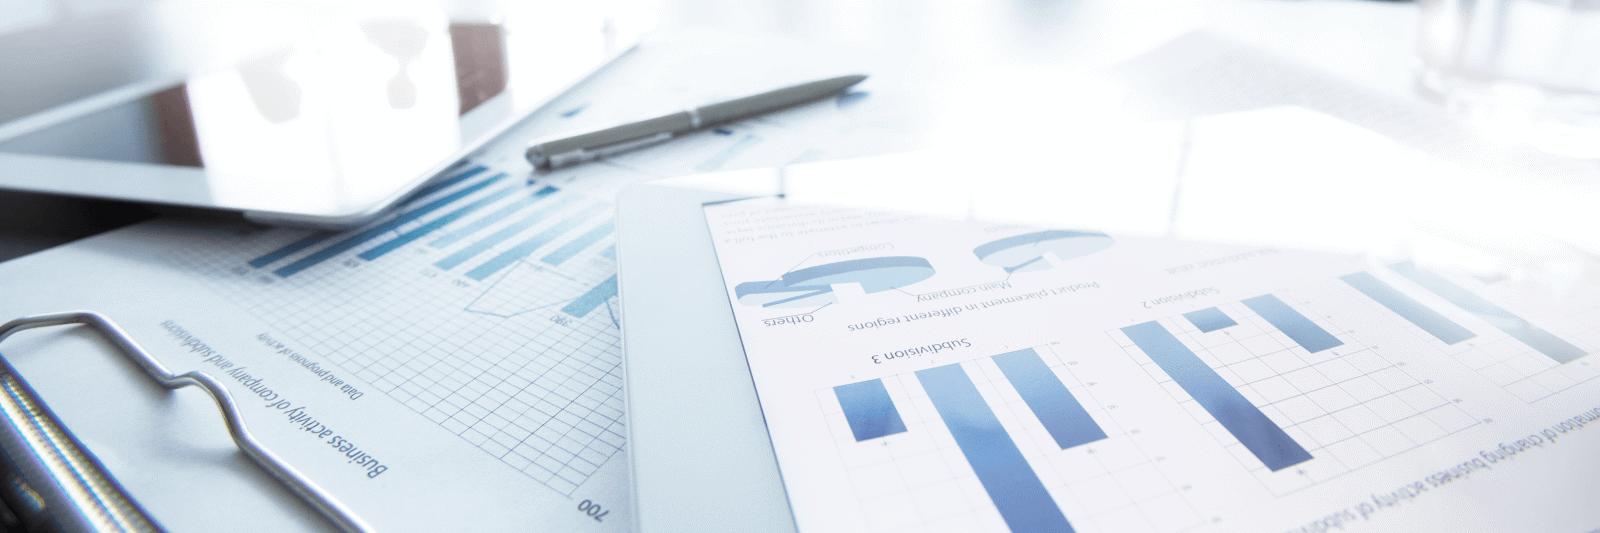 Tobii financial report illustration